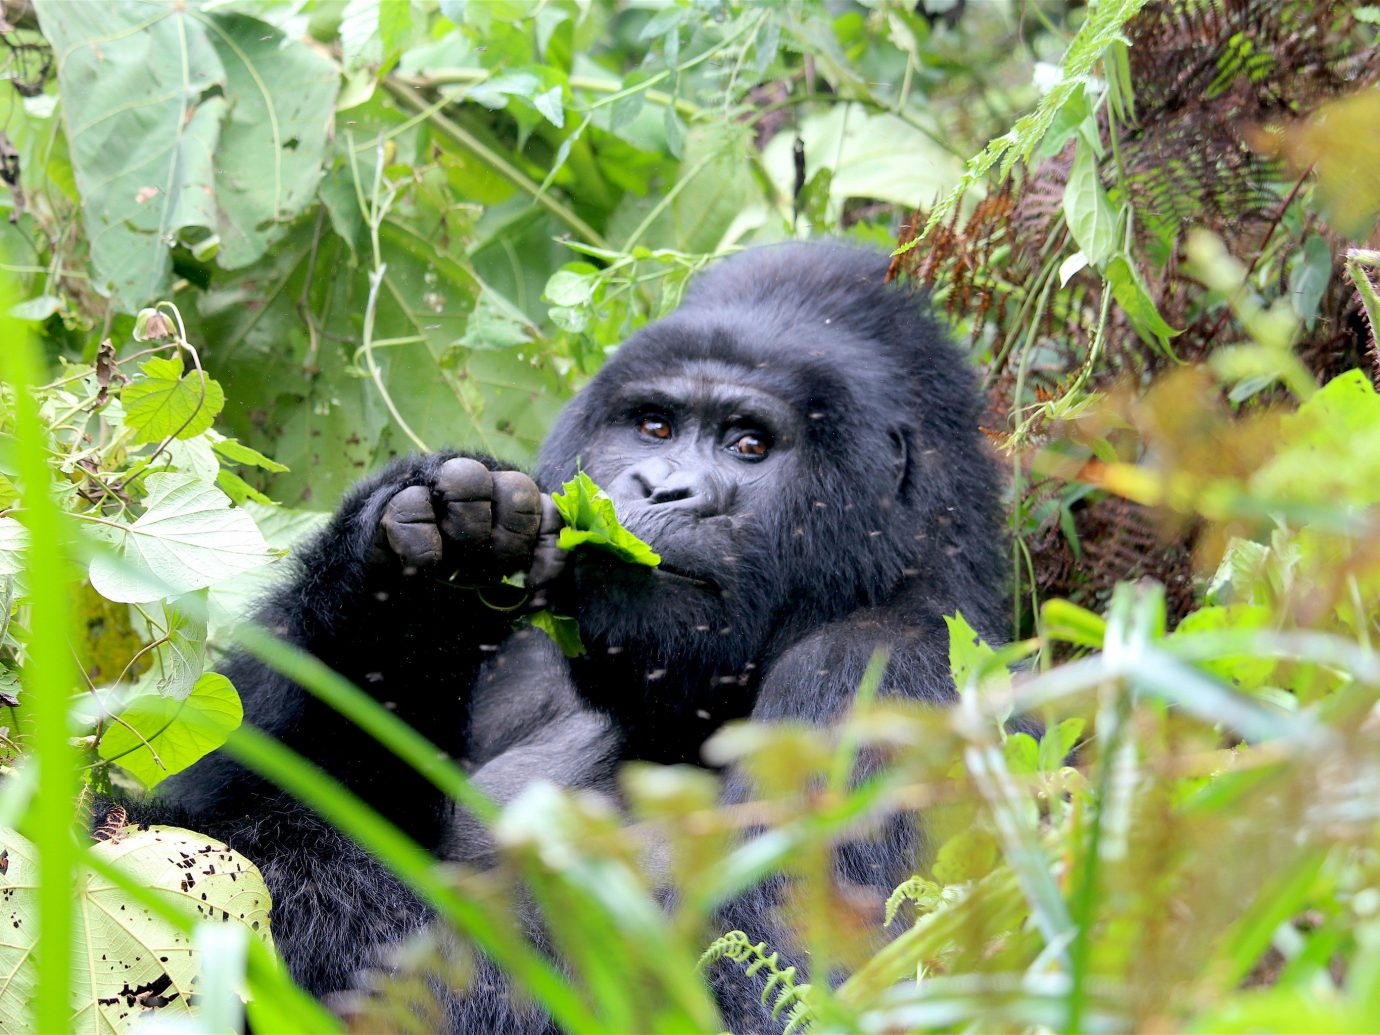 africa Trip Ideas outdoor animal mammal great ape ape fauna primate black leaf western gorilla rainforest Wildlife terrestrial animal grass Jungle plant organism chimpanzee common chimpanzee tree Forest